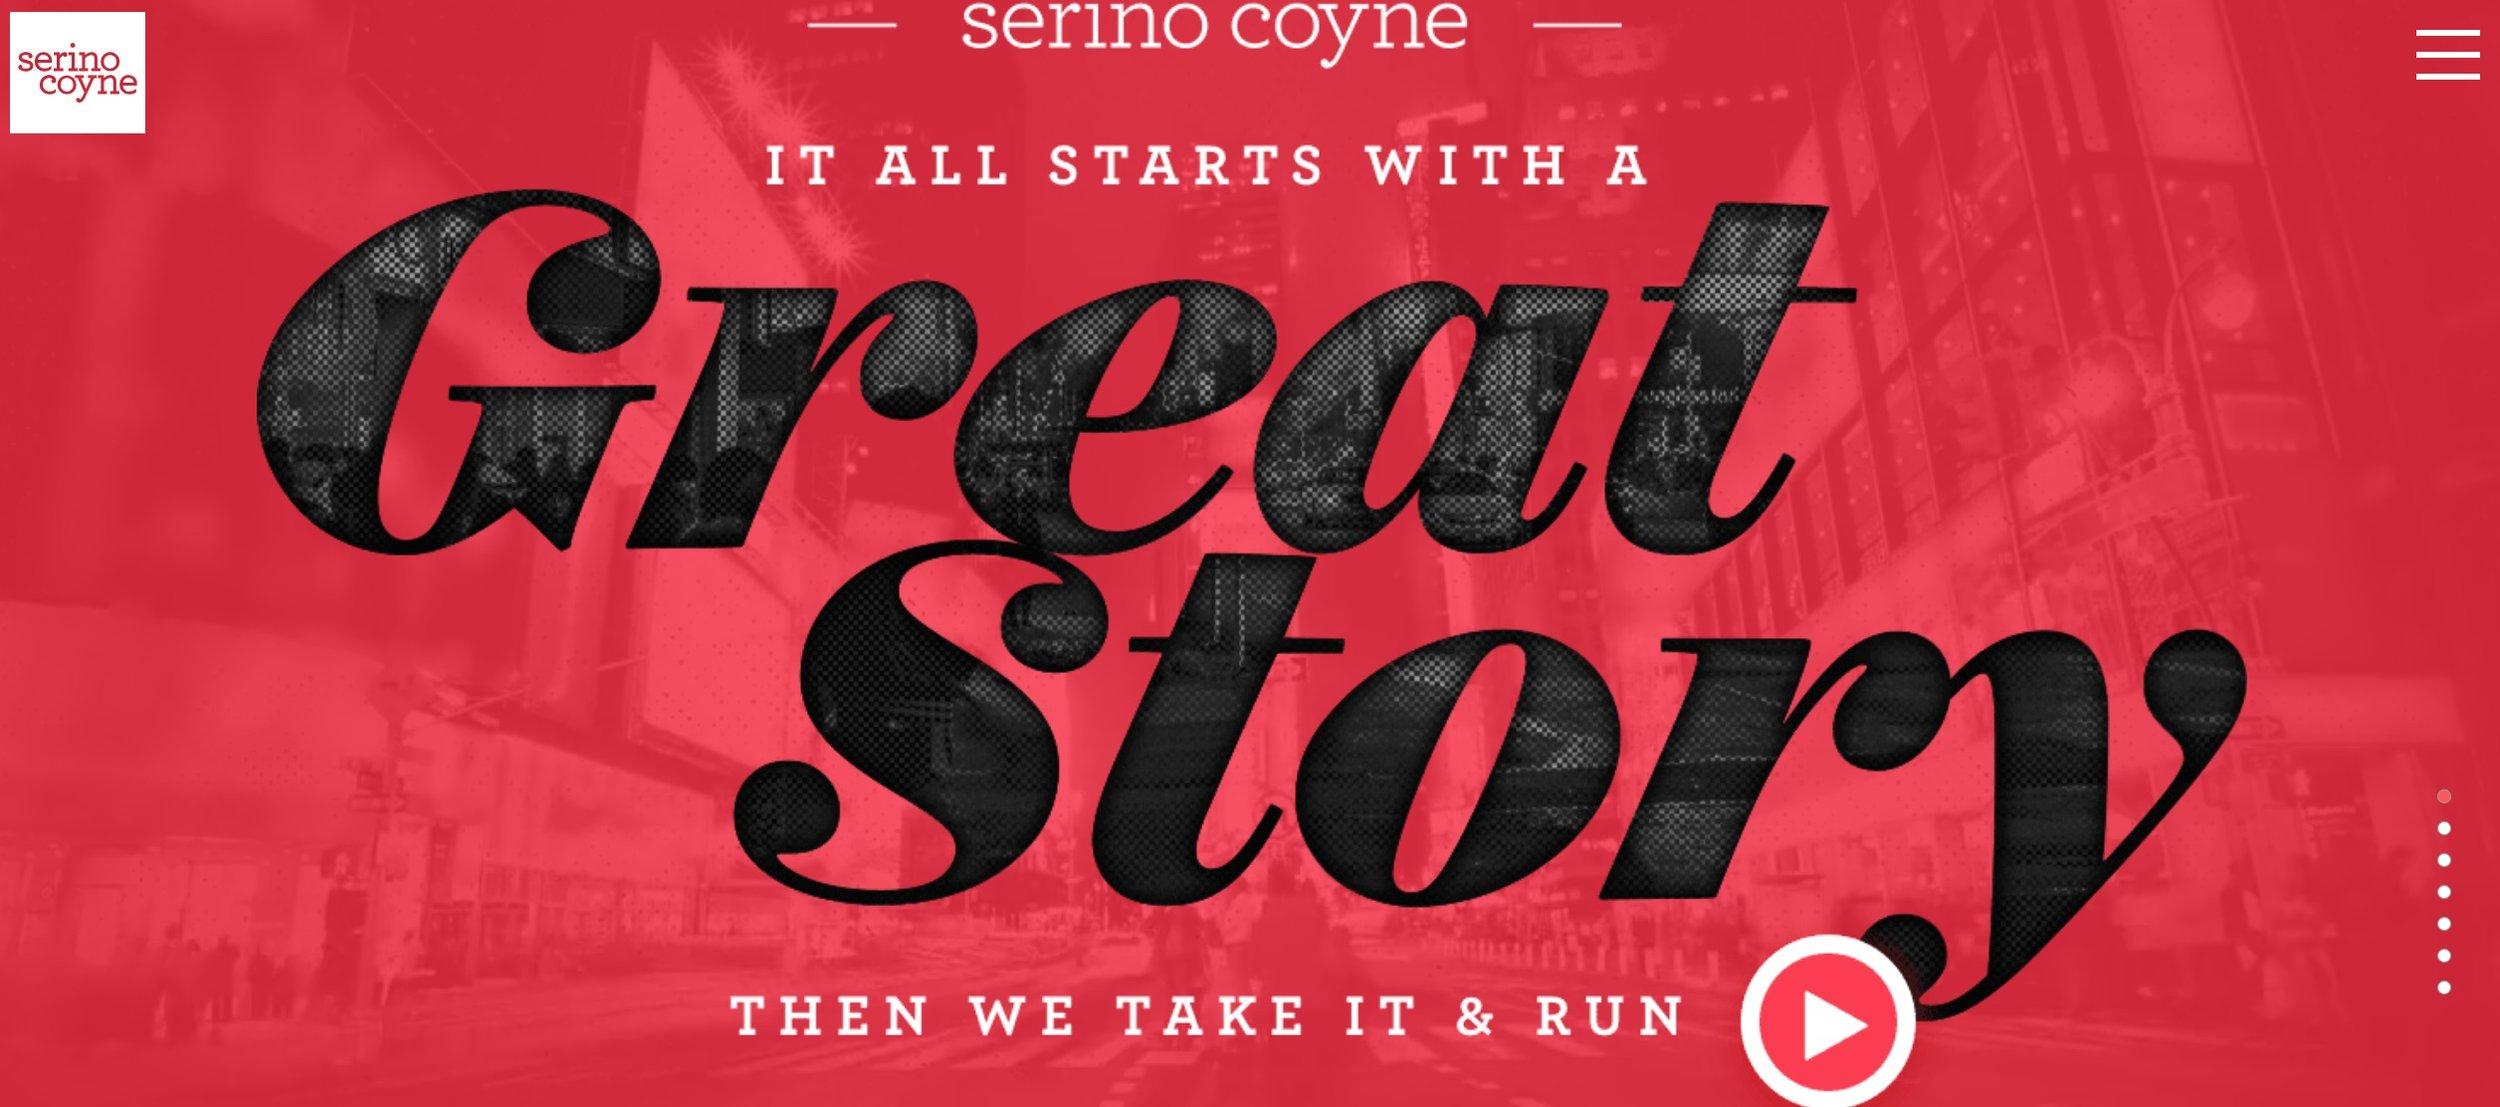 Serino Coyne Work Overview Image.jpg